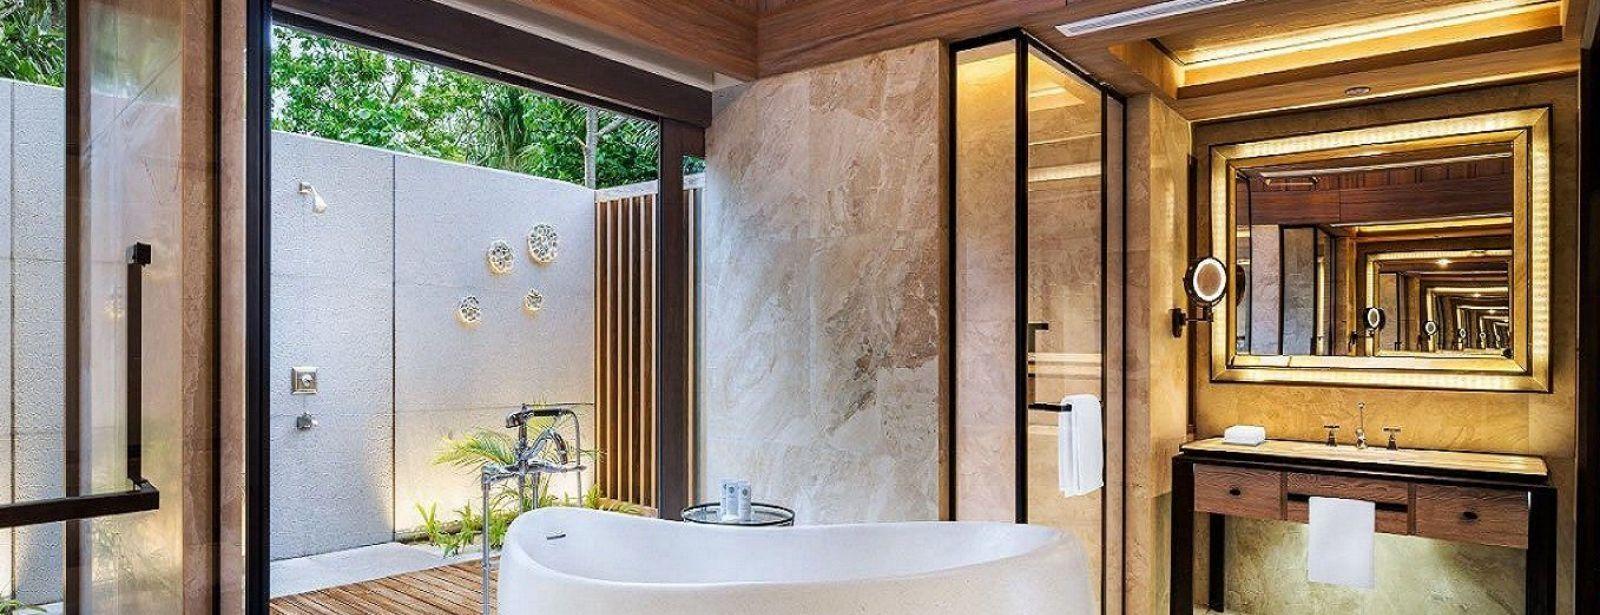 St RegisWC-1-Bath-Room3-1600x900.1.jpg